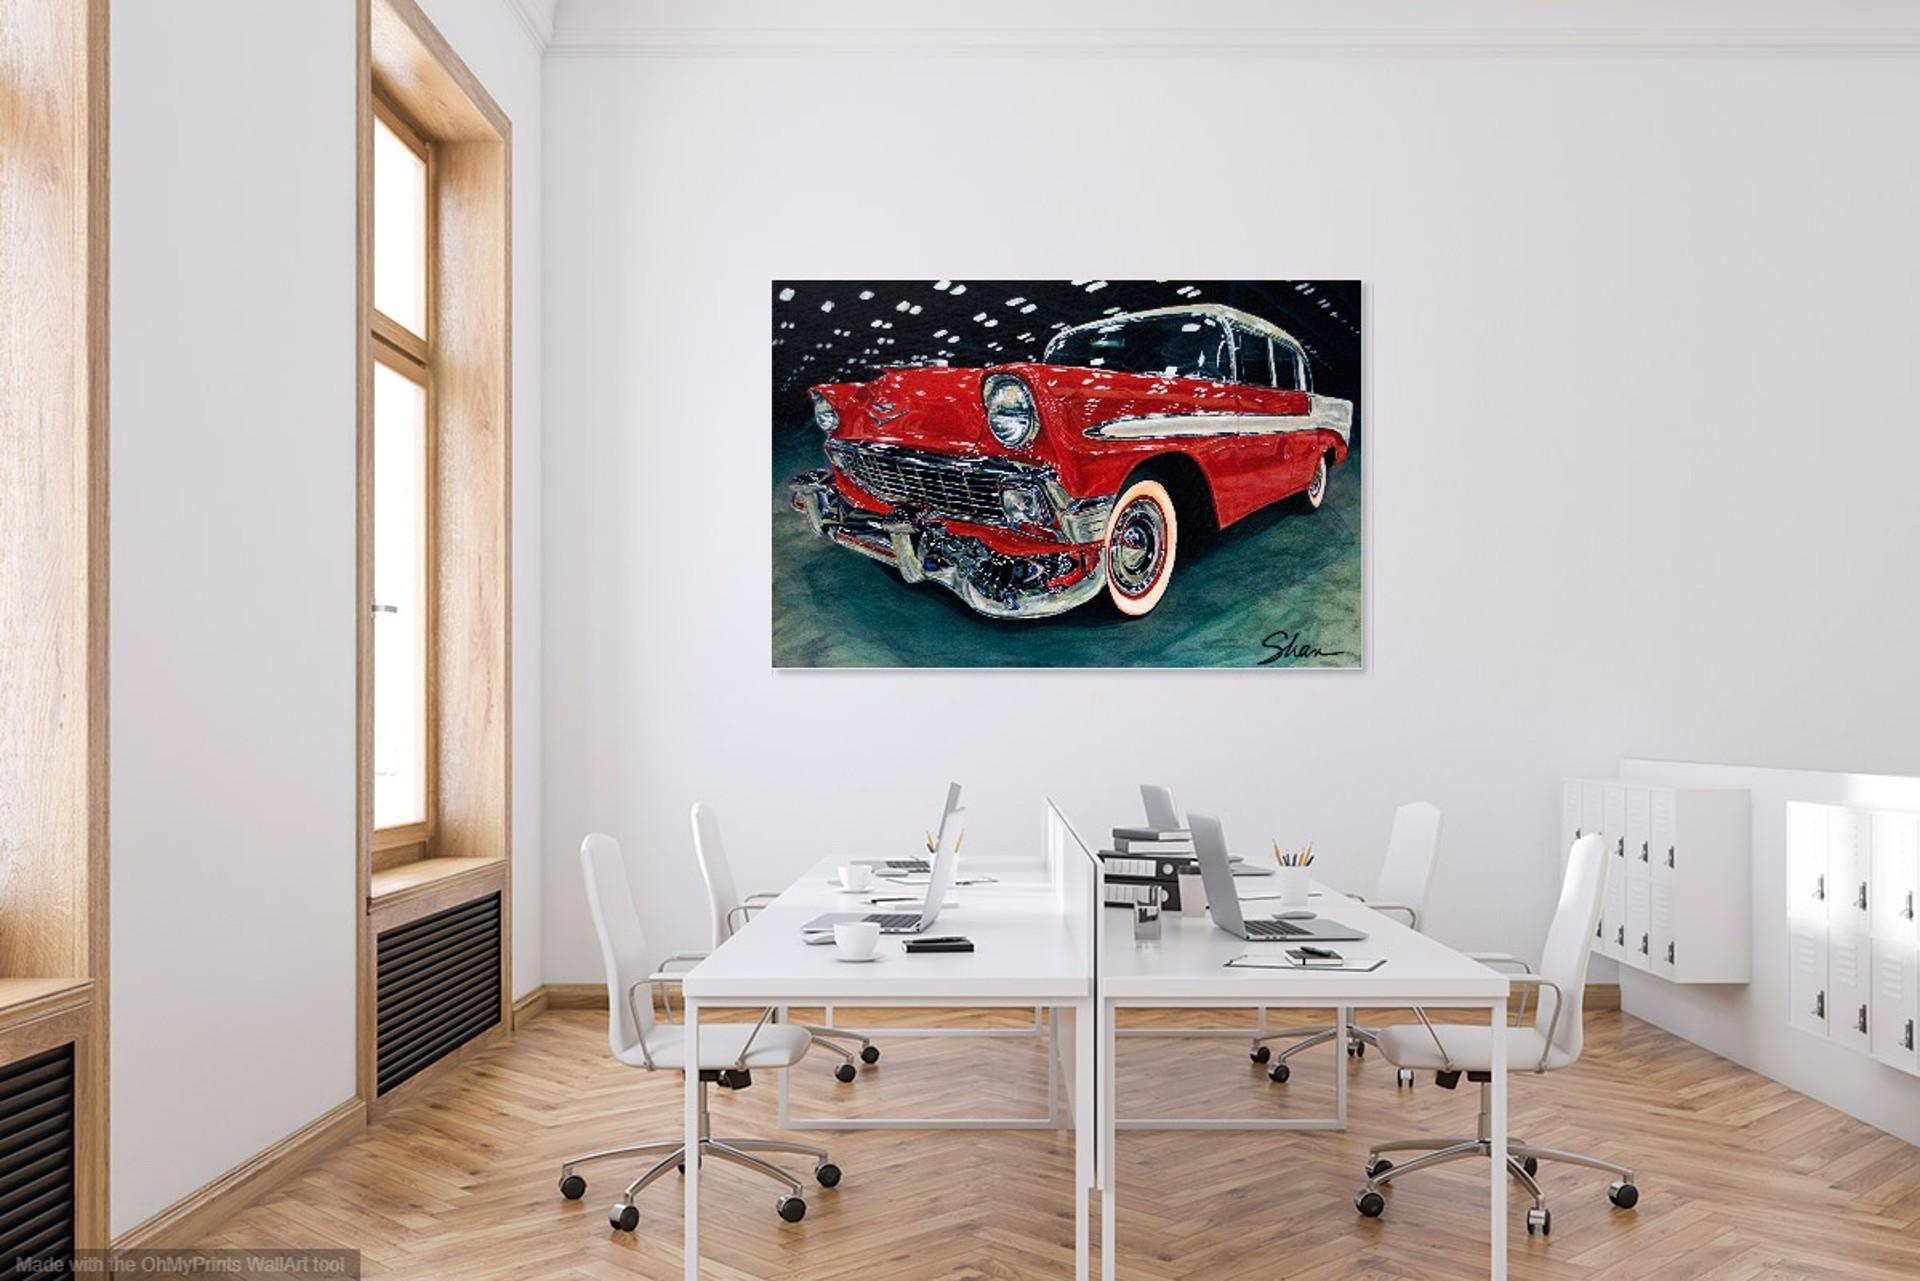 1956 Chevrolet Bel Air by Shan Fannin